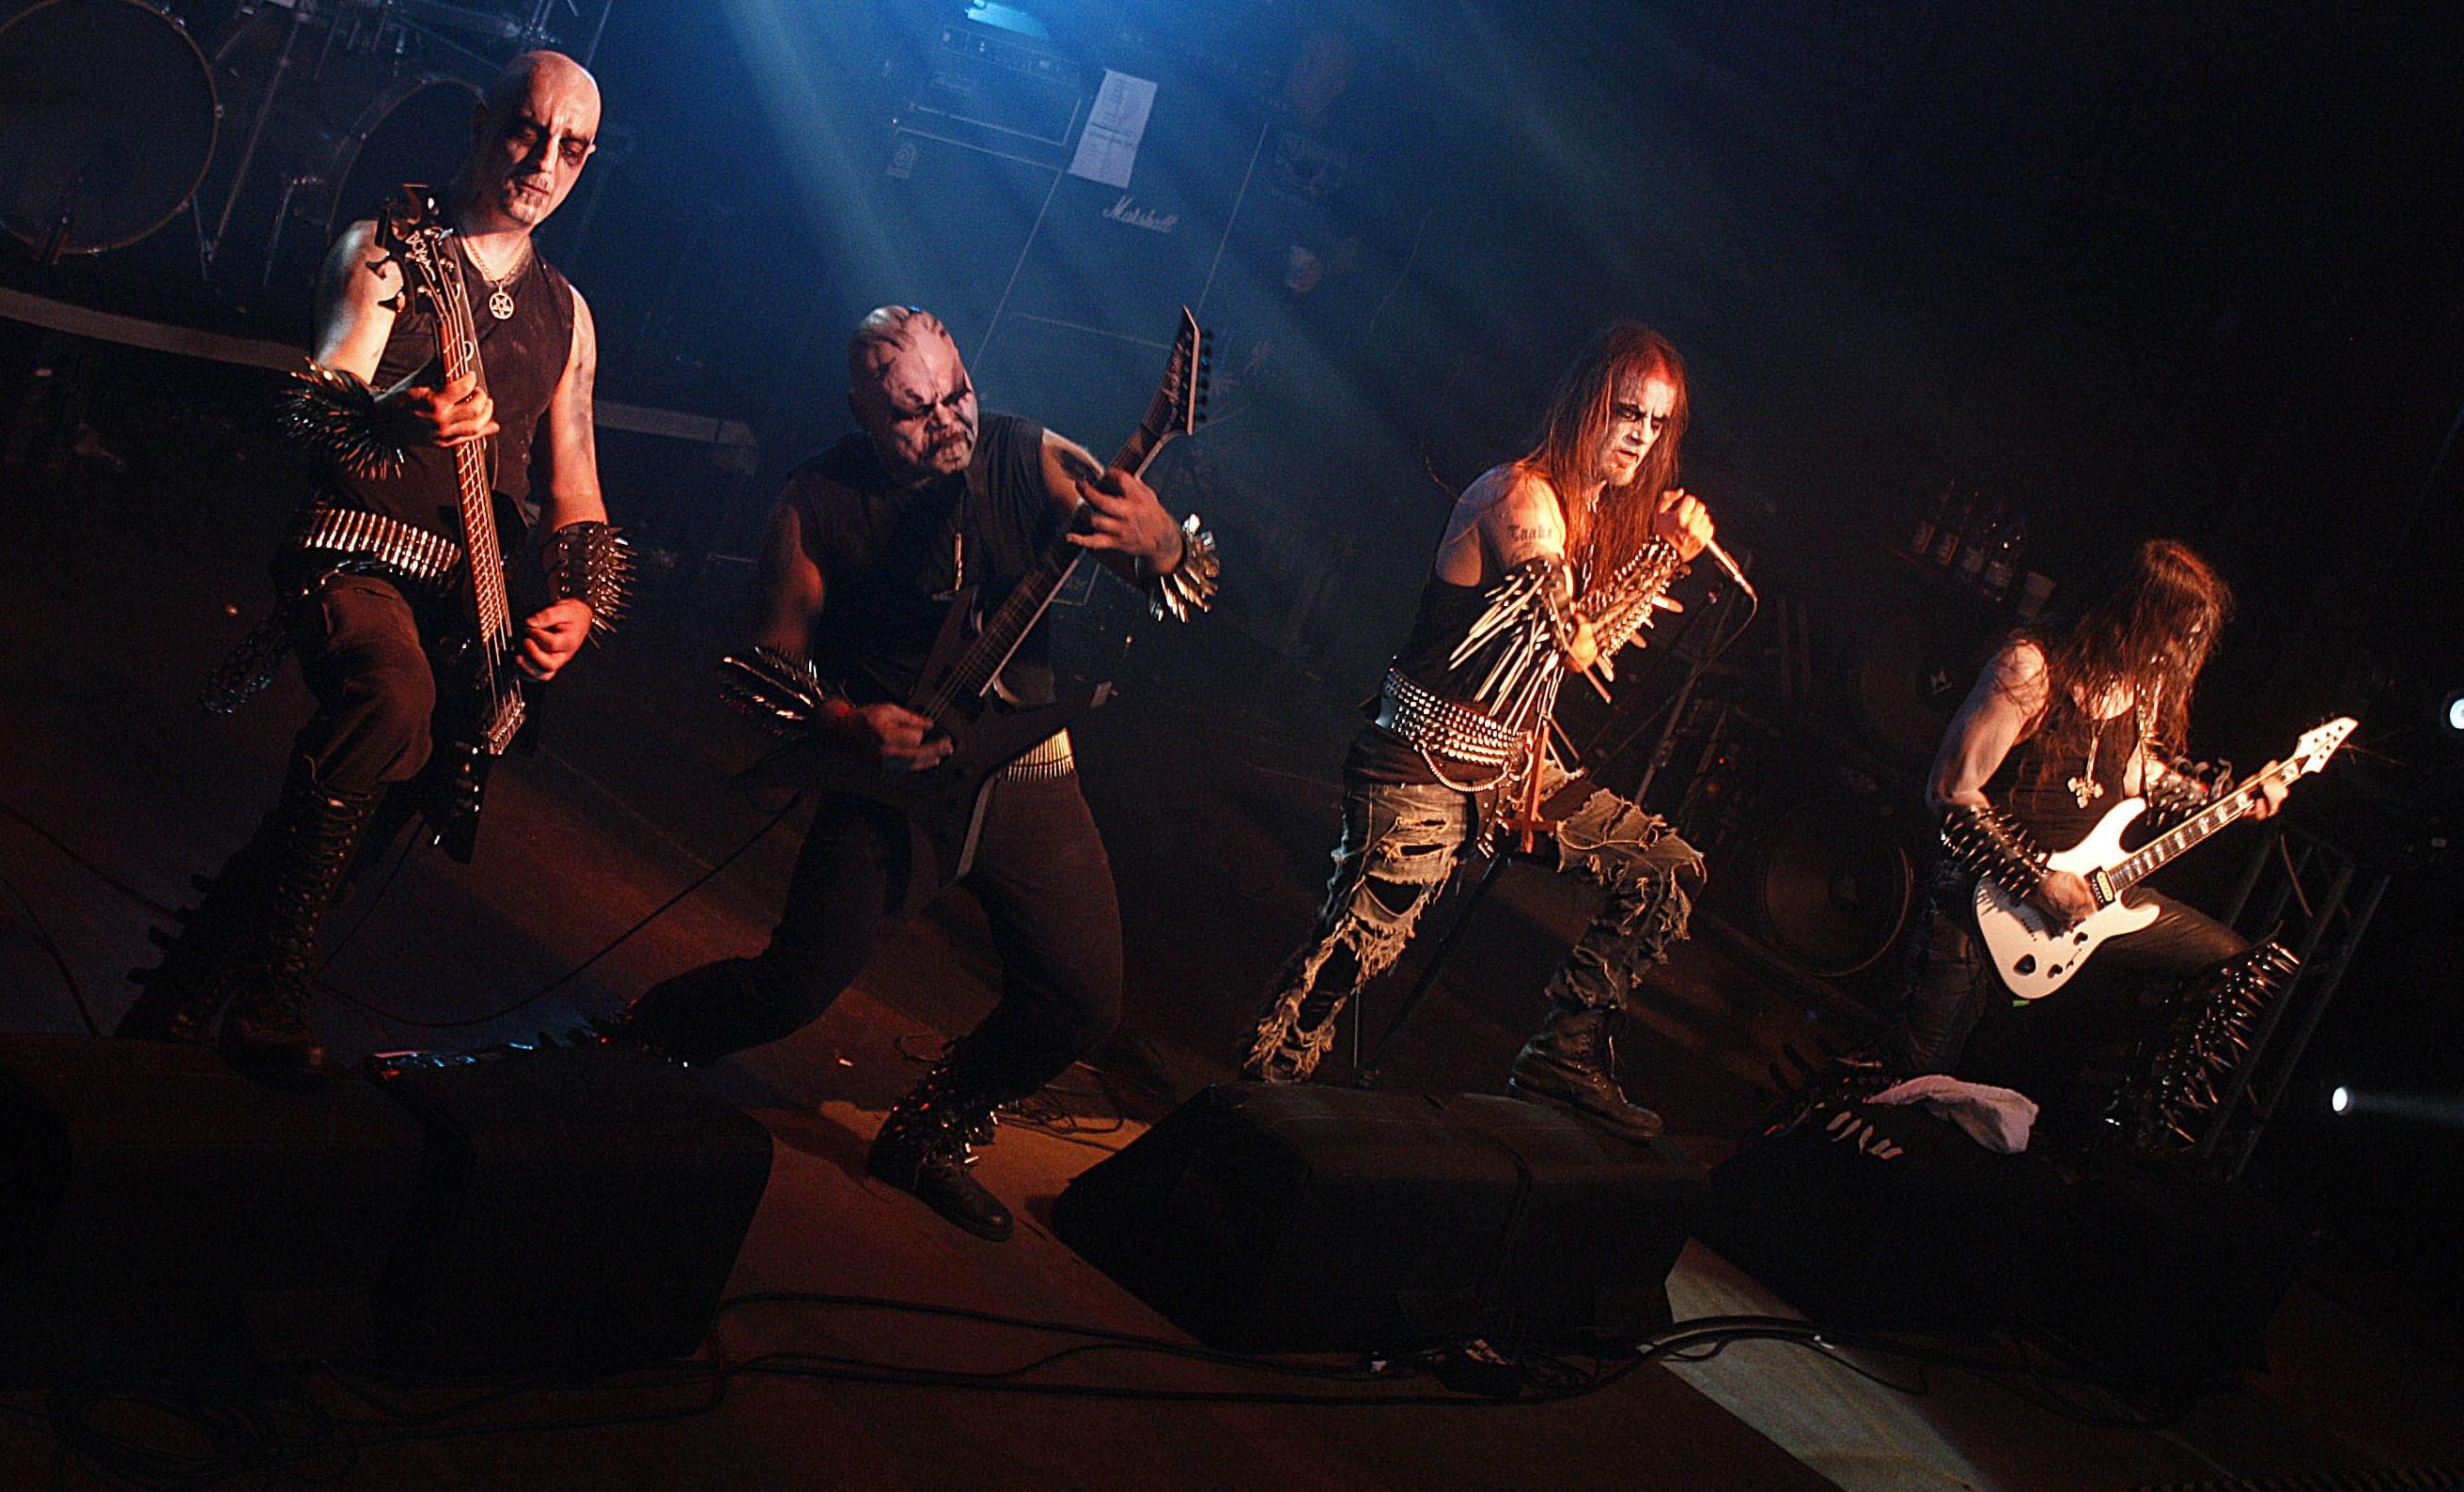 Band Wallpapers Music Artists: Gorgoroth HD Wallpaper